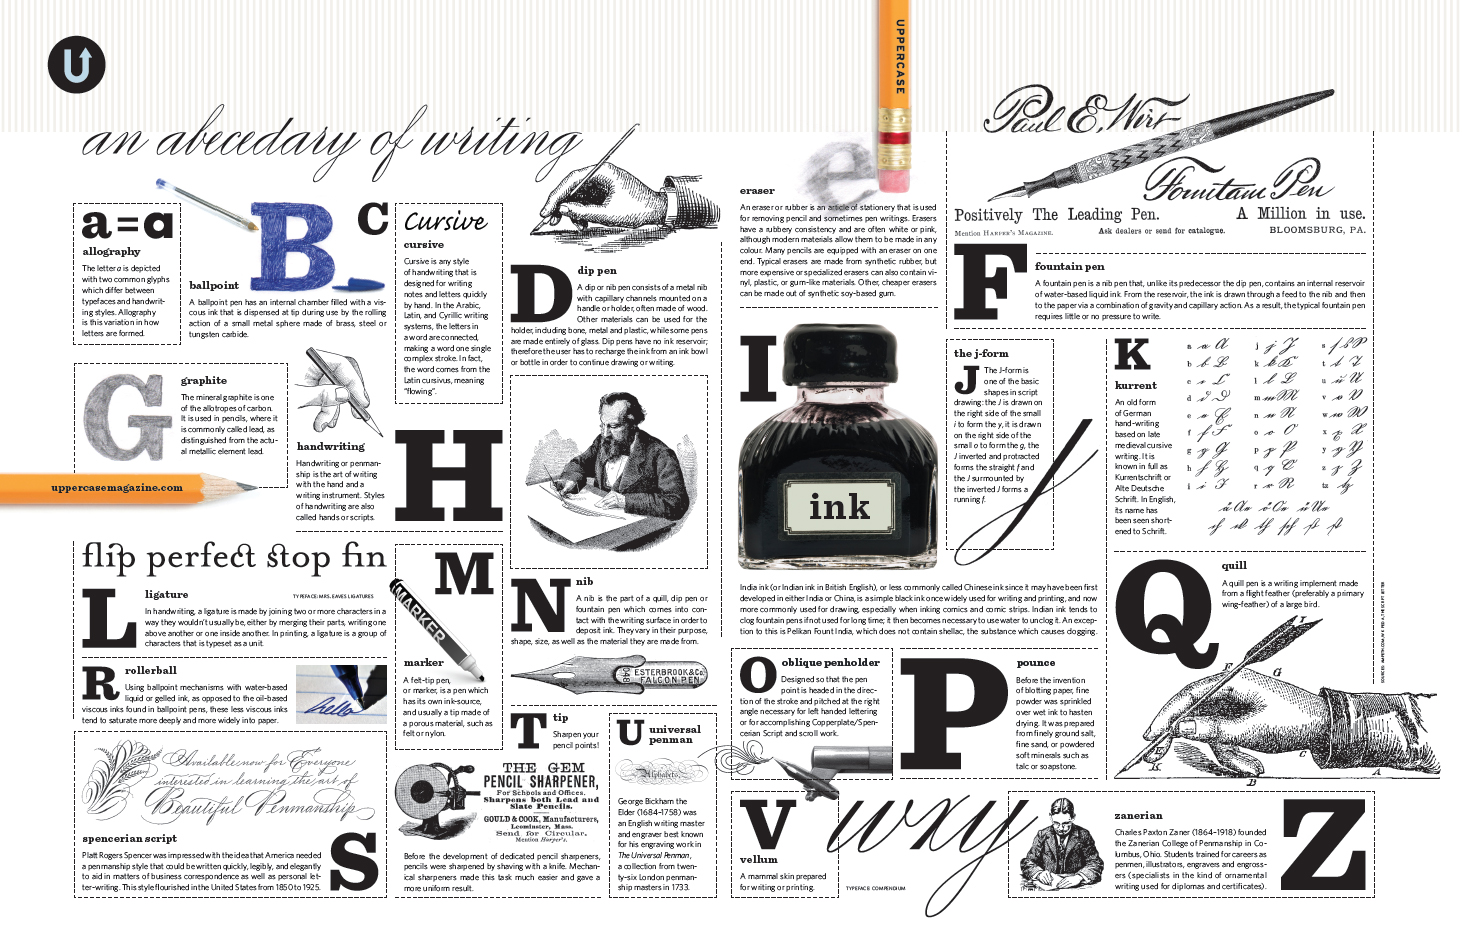 The Abecedary of Writing — Calligrafile